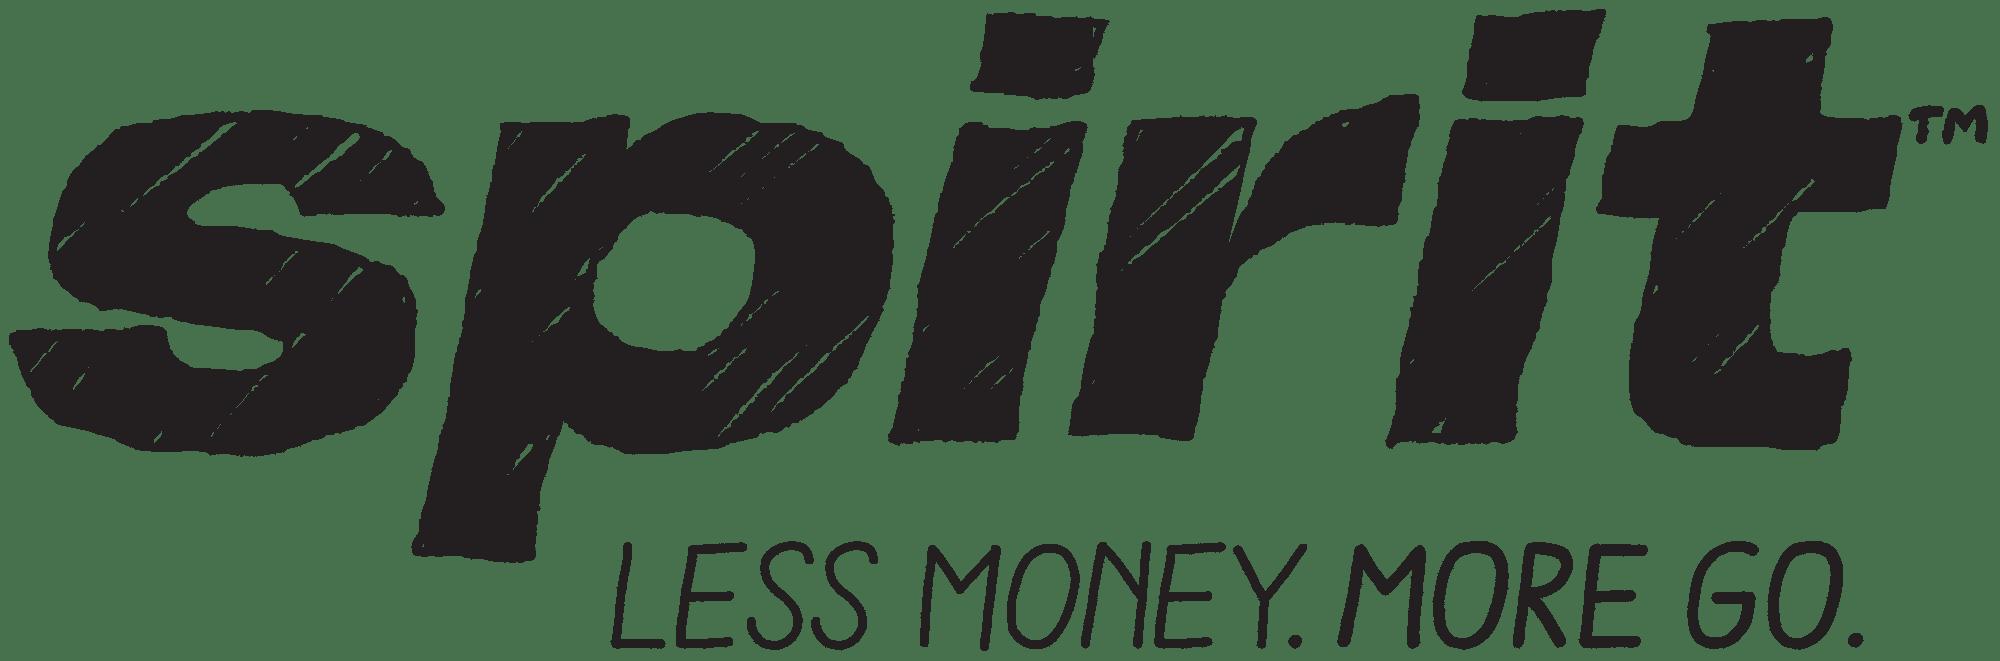 Spirit airlines company logo